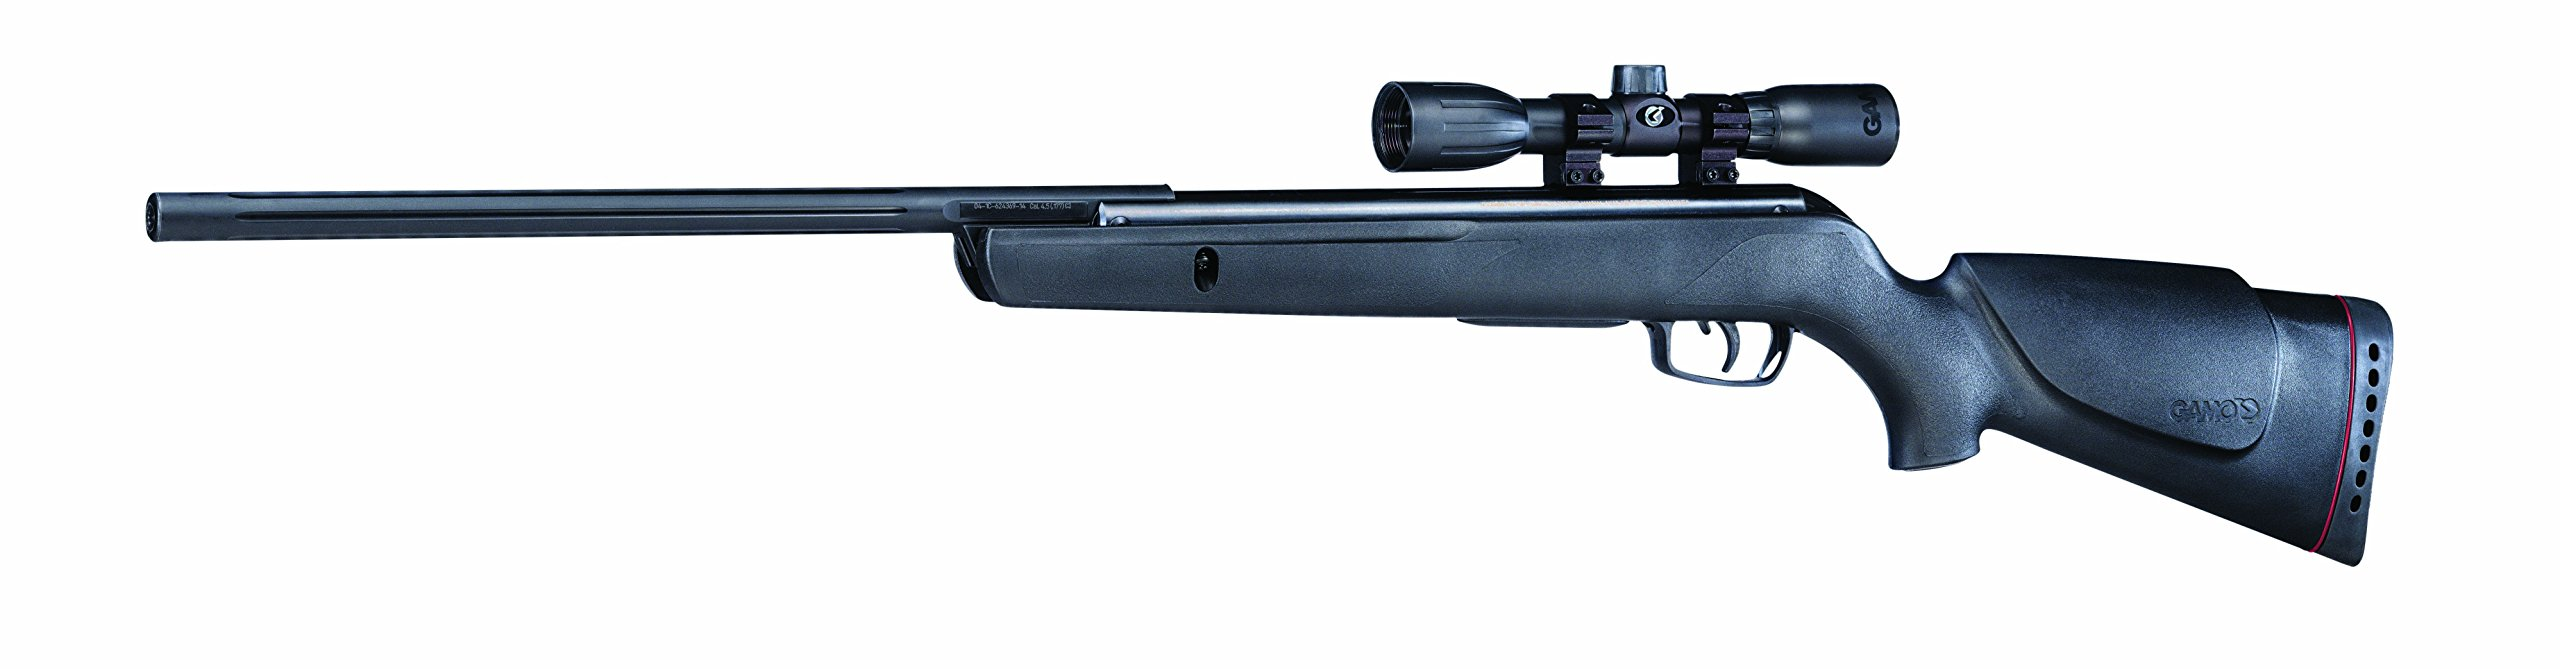 Gamo 6110017154 Varmint Air Rifle .177 Cal by Gamo